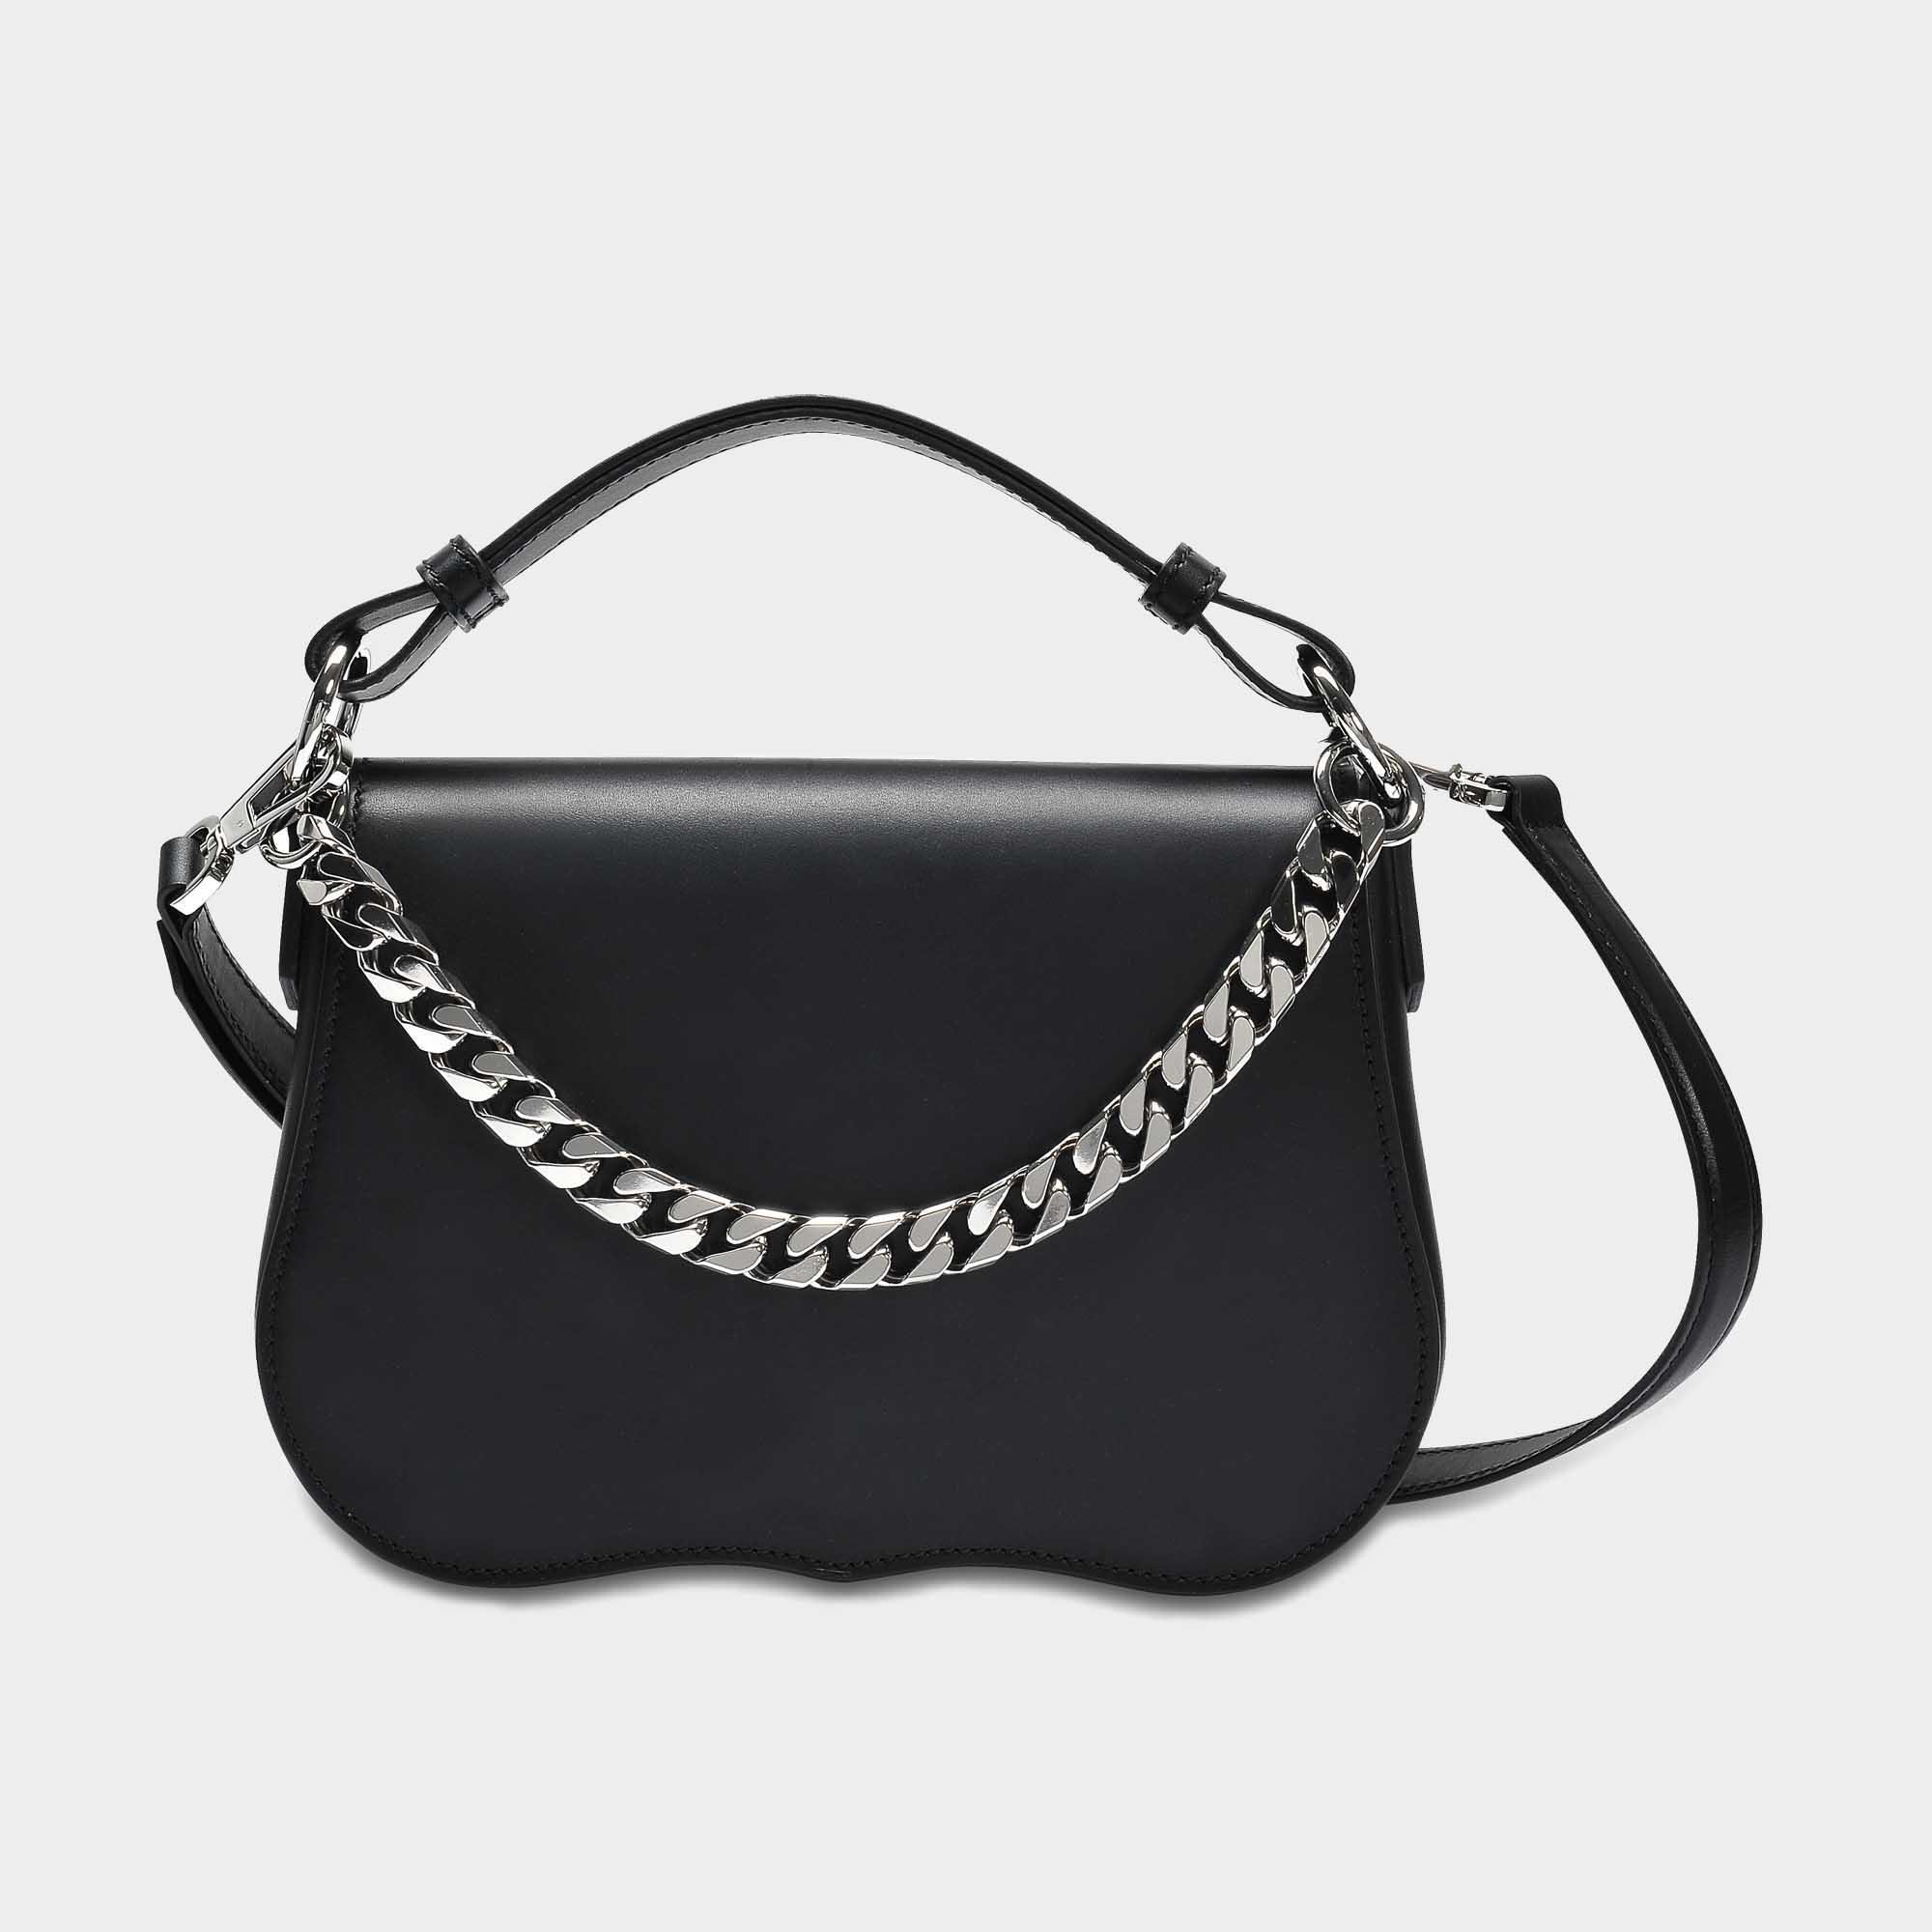 Small Shoulder Bag with Chain in Black Calfskin CALVIN KLEIN 205W39NYC 7sxpx